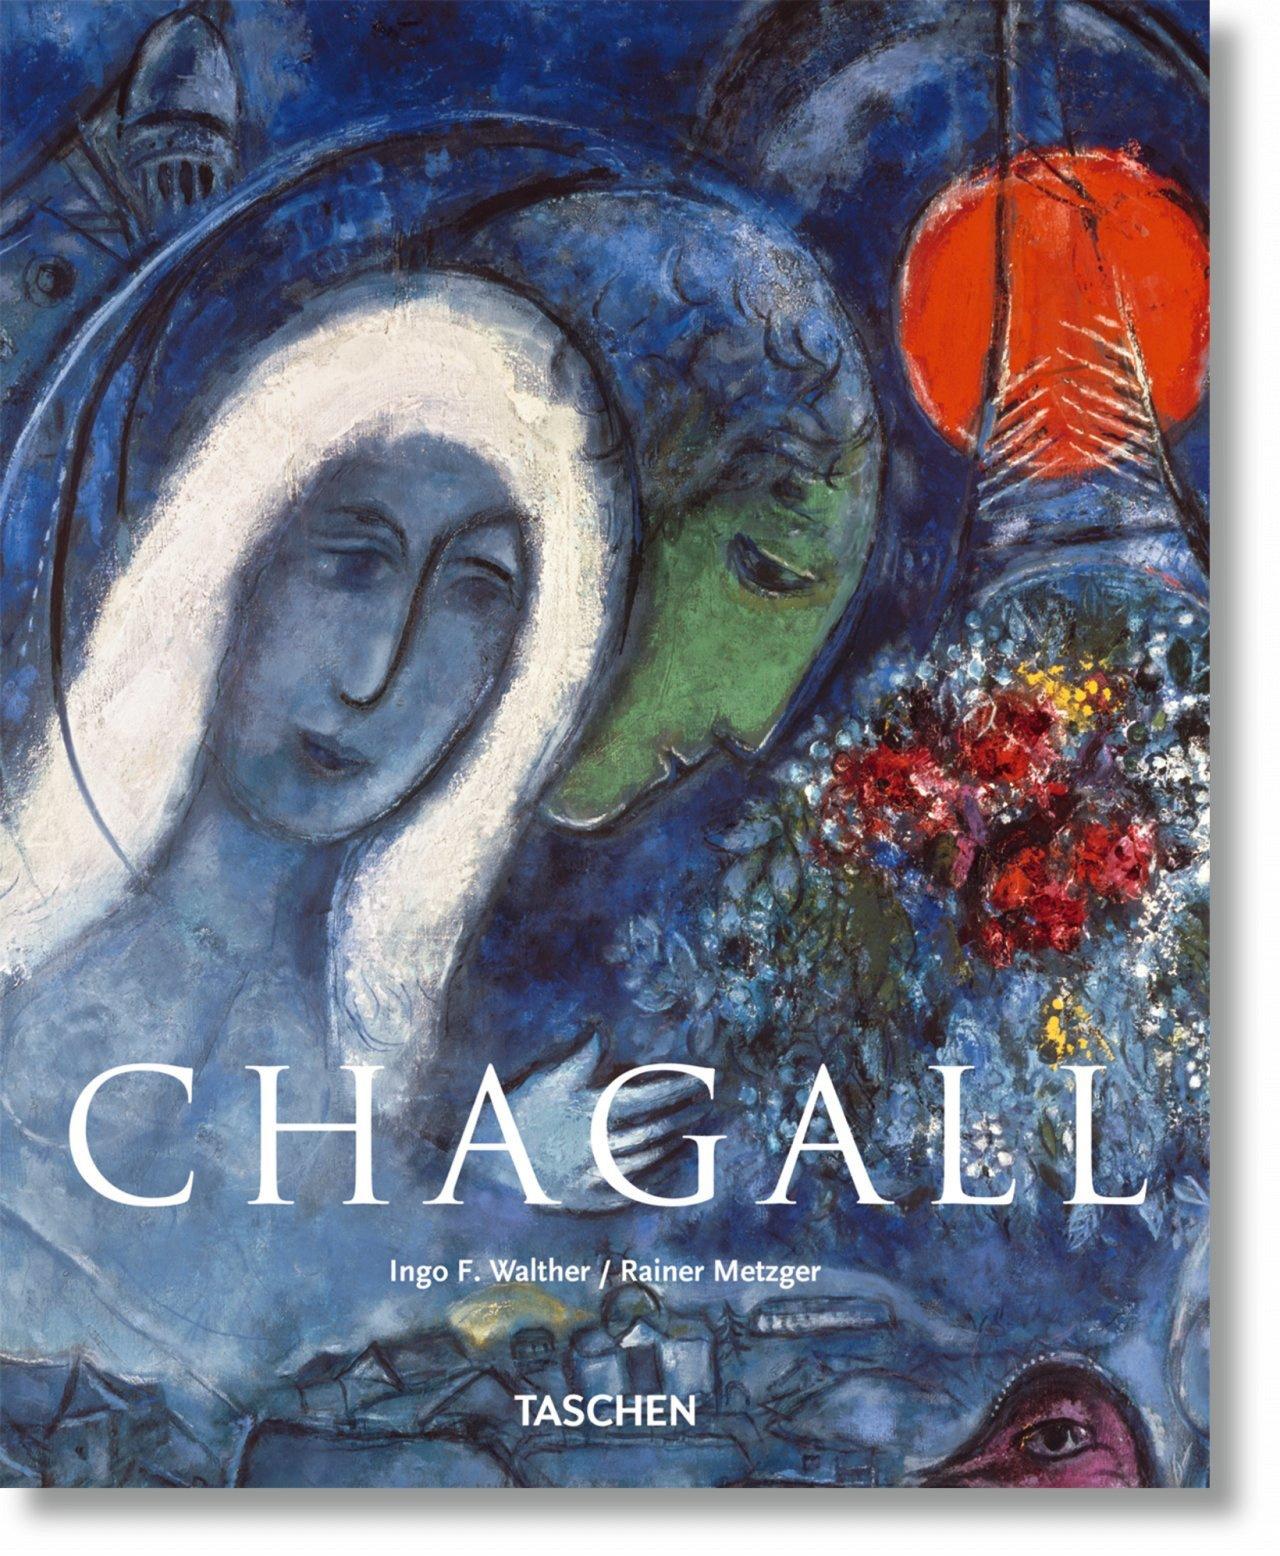 KA-CHAGALL